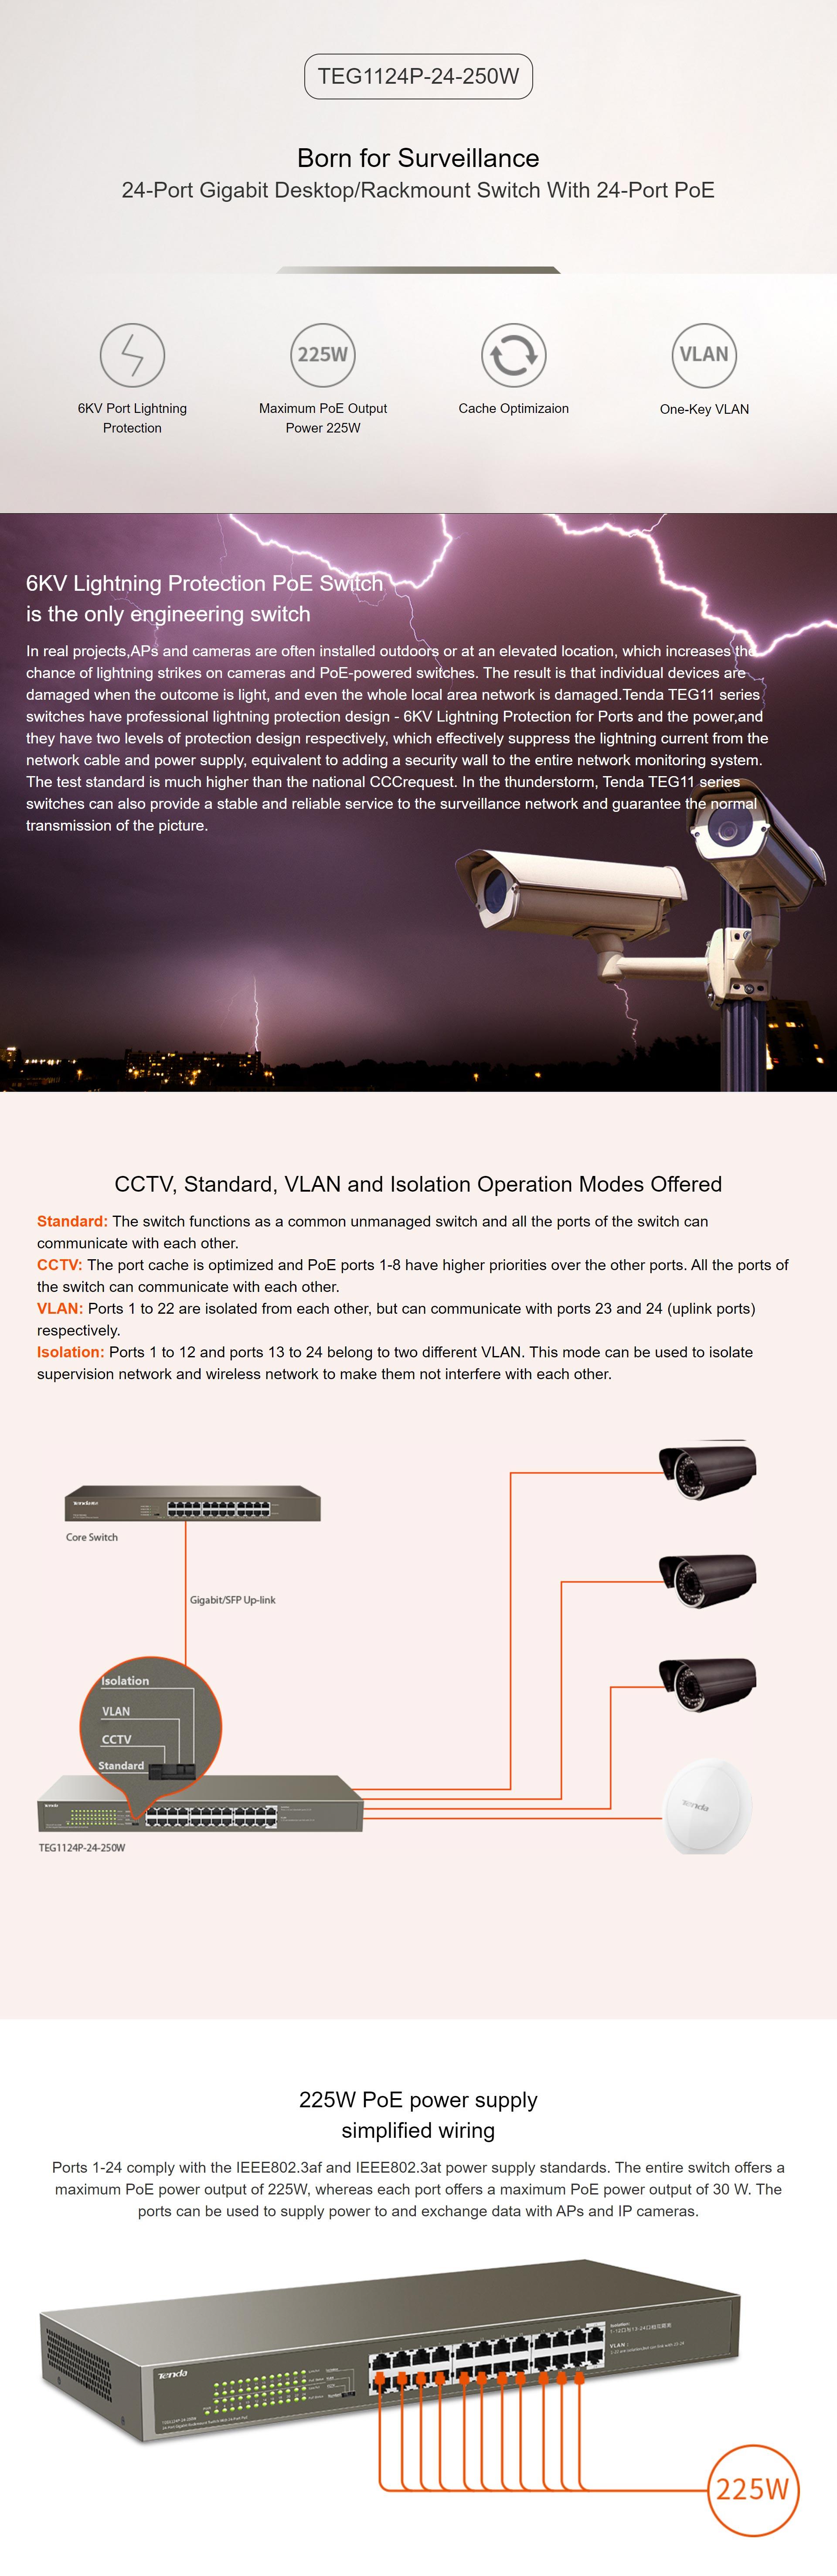 screencapture-tendacn-au-product-TEG1124P-24-250W-html-2021-08-02-11_00_04.jpg